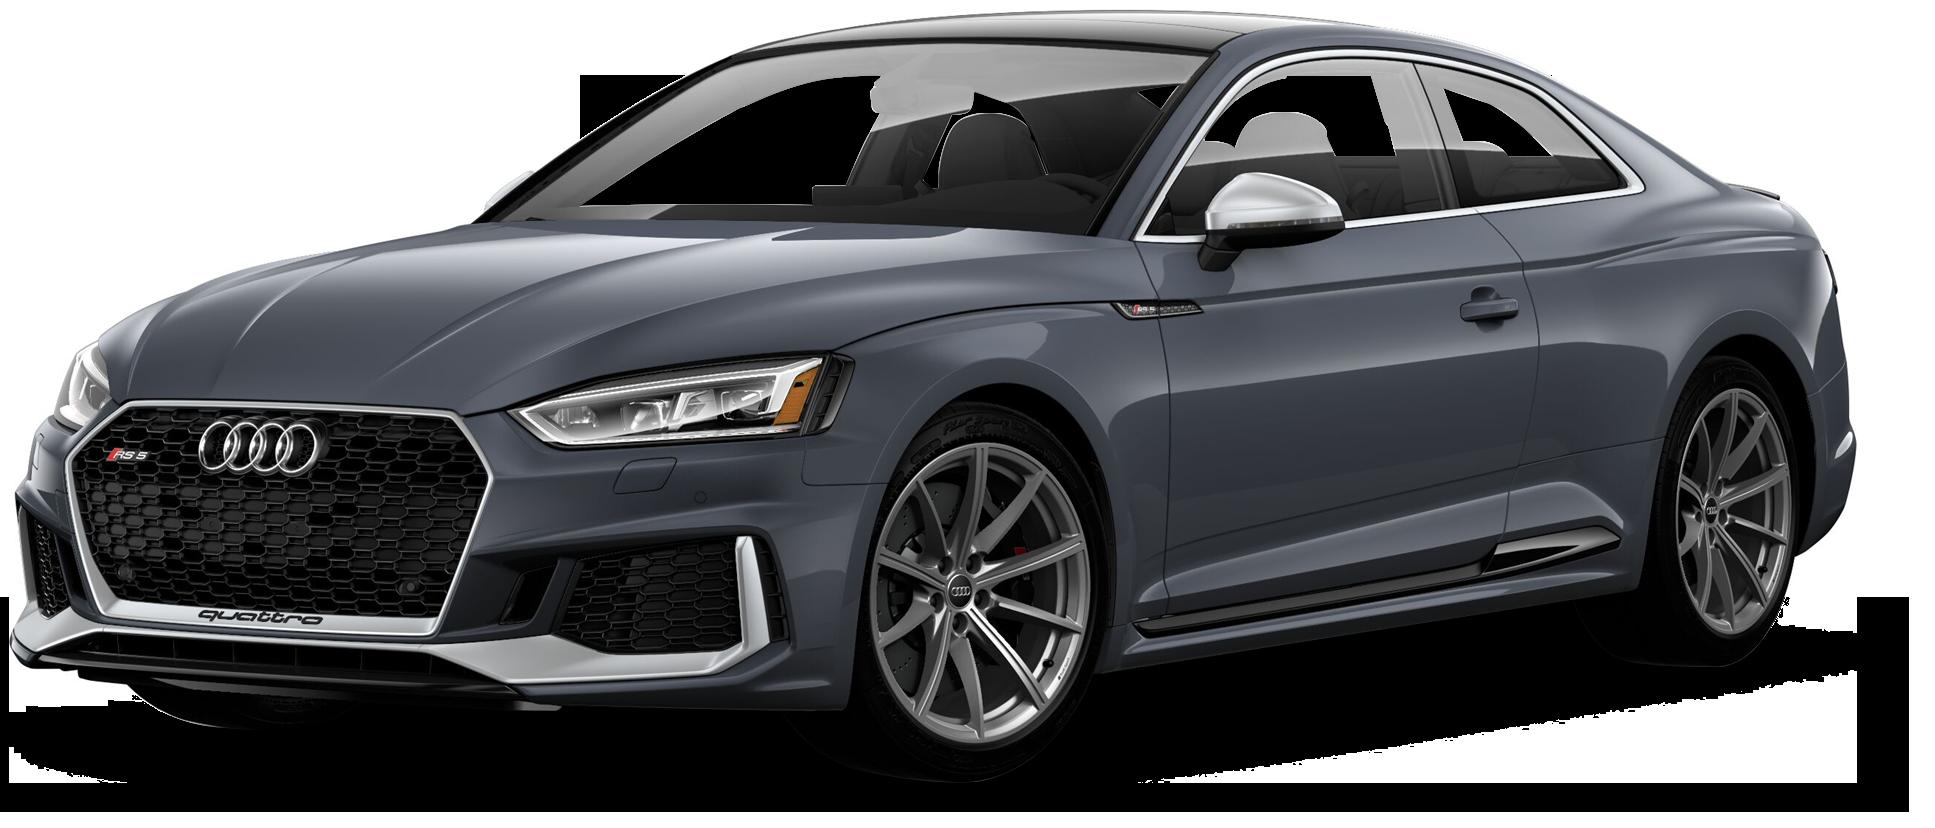 Audi South Austin Incentives Lease Finance Offers A A A - Audi financial